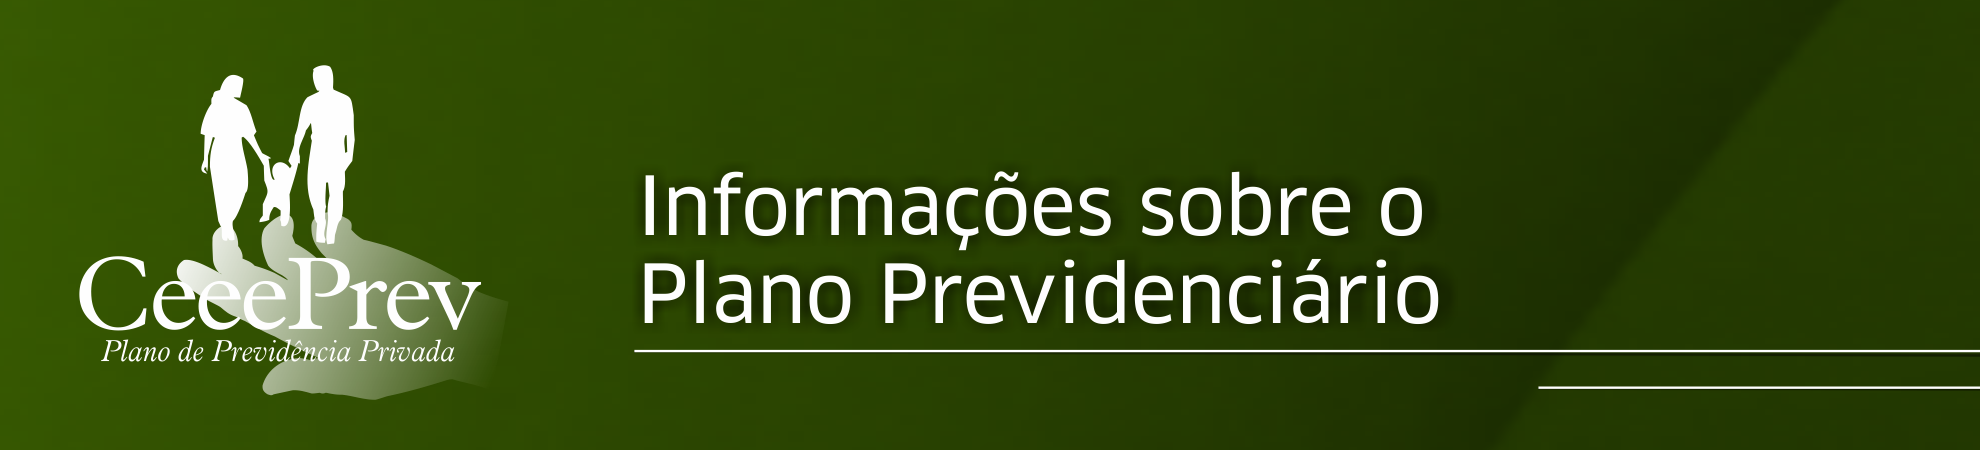 cabecalho_informacoes_ceeeprev